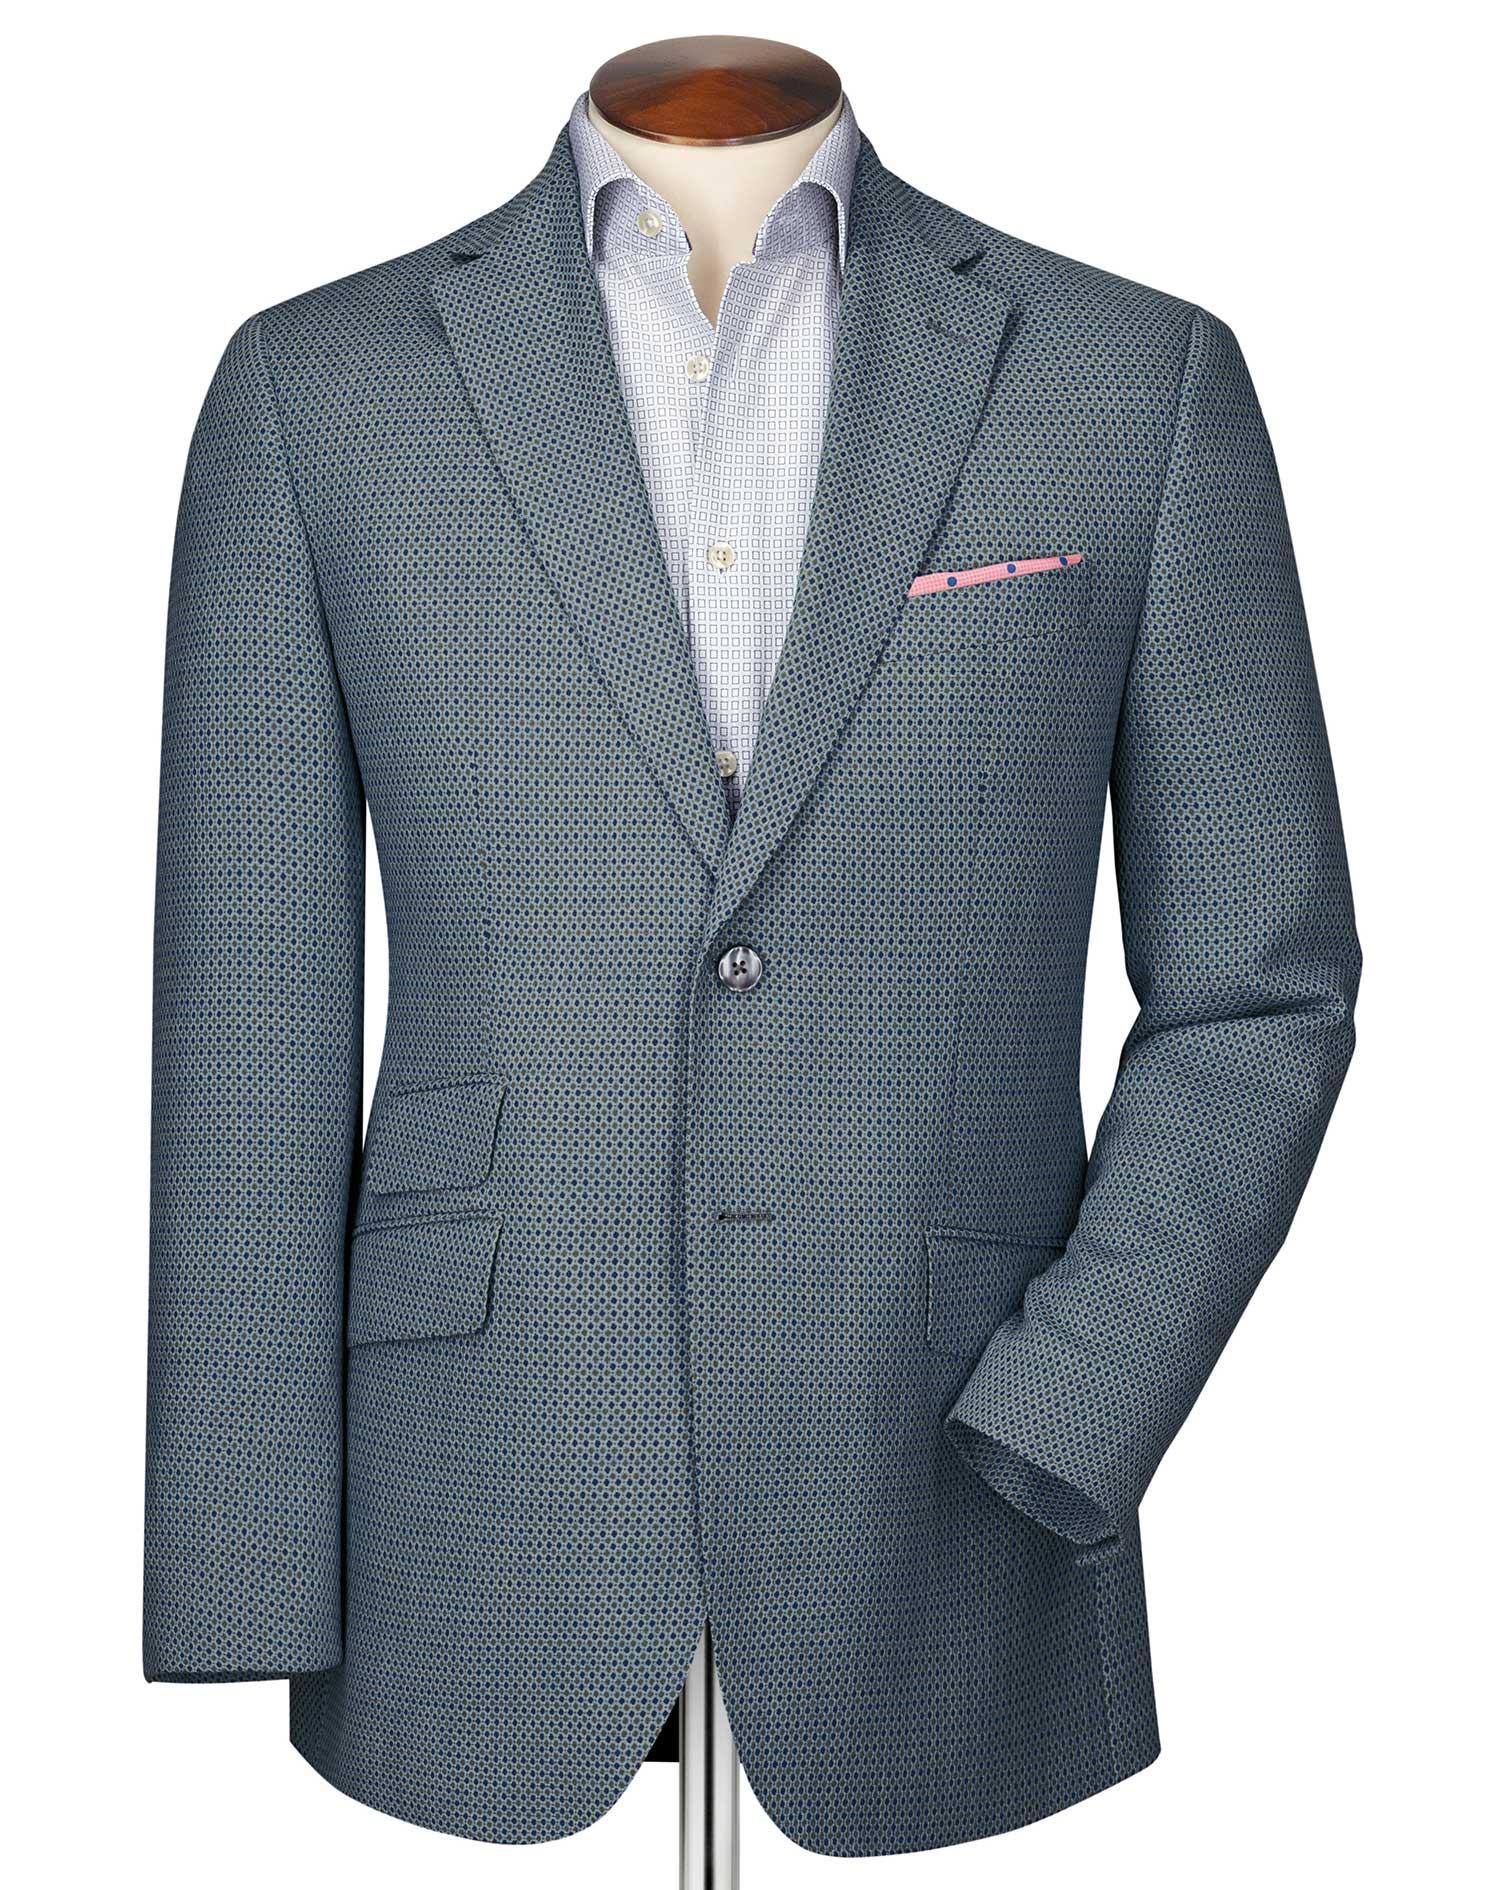 Slim Fit Grey Birdseye Wool Wool Jacket Size 38 Regular by Charles Tyrwhitt